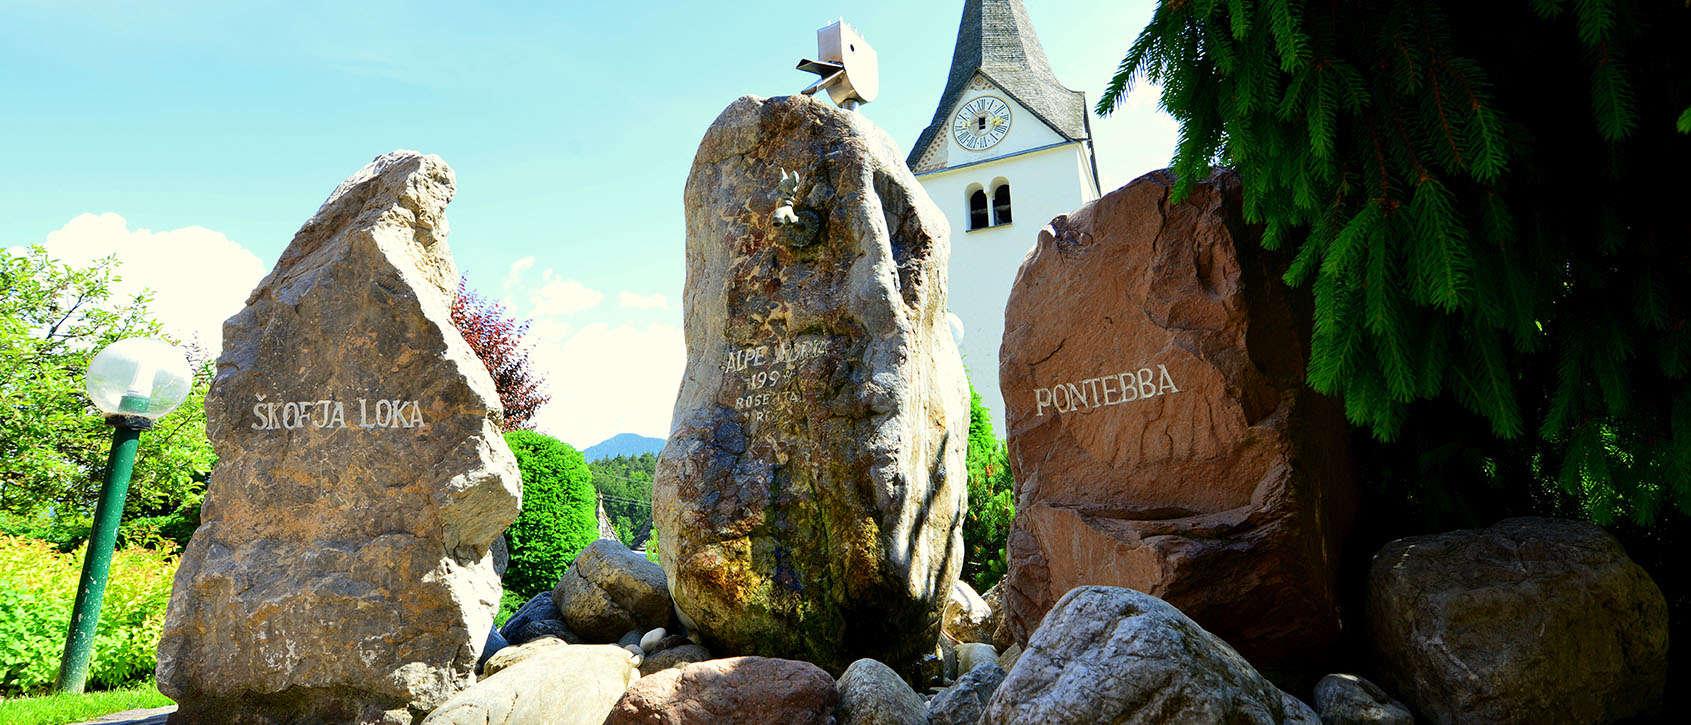 Alpe - Adria - Feeling